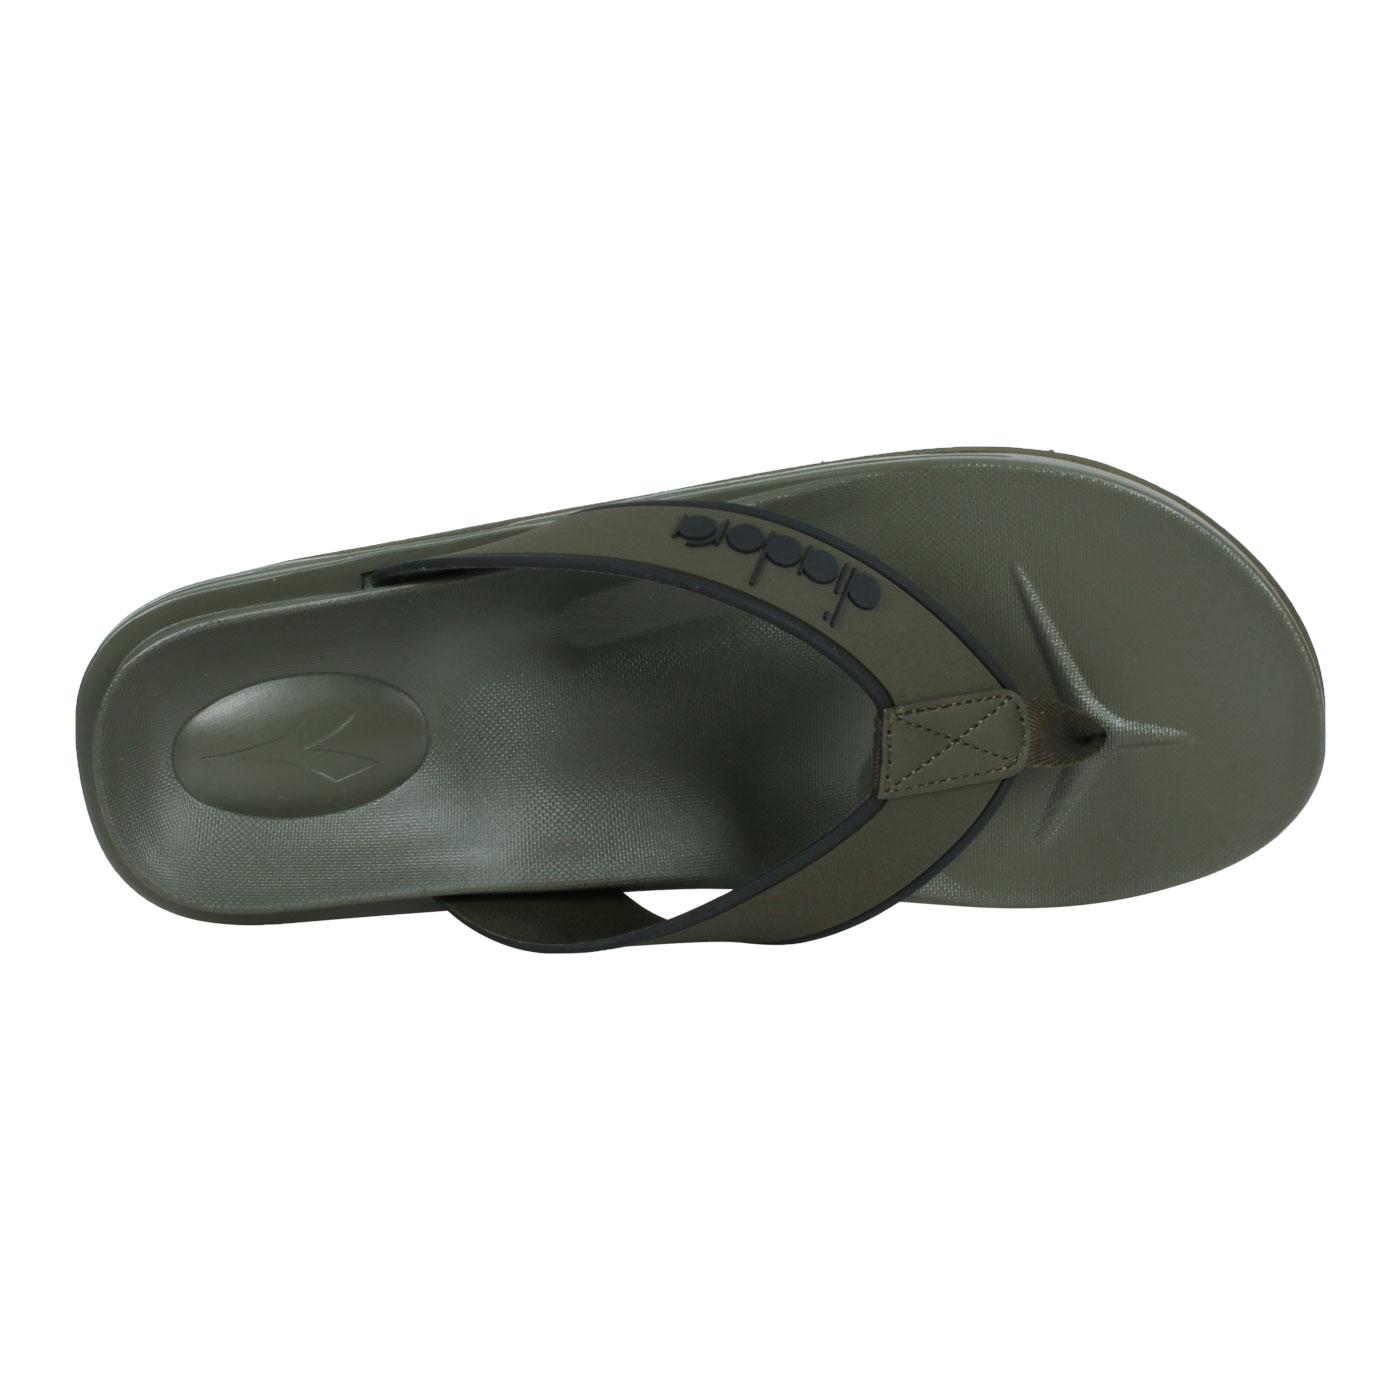 DIADORA 男款拖鞋 DA71208 - 軍綠黑